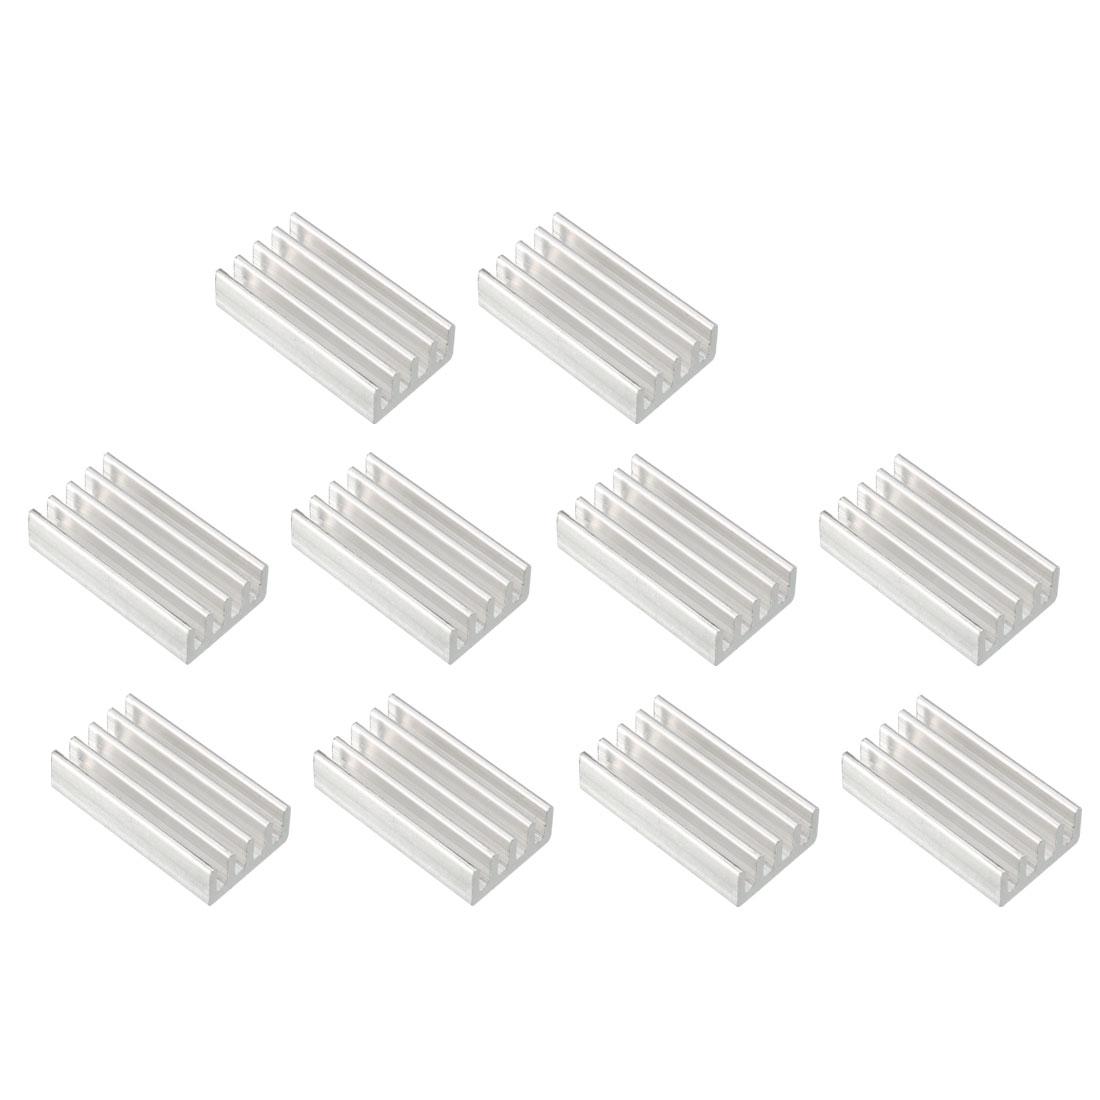 Aluminum Heatsink Cooler Circuit Board Cooling Silver Tone 20mmx11mmx5mm 10Pcs